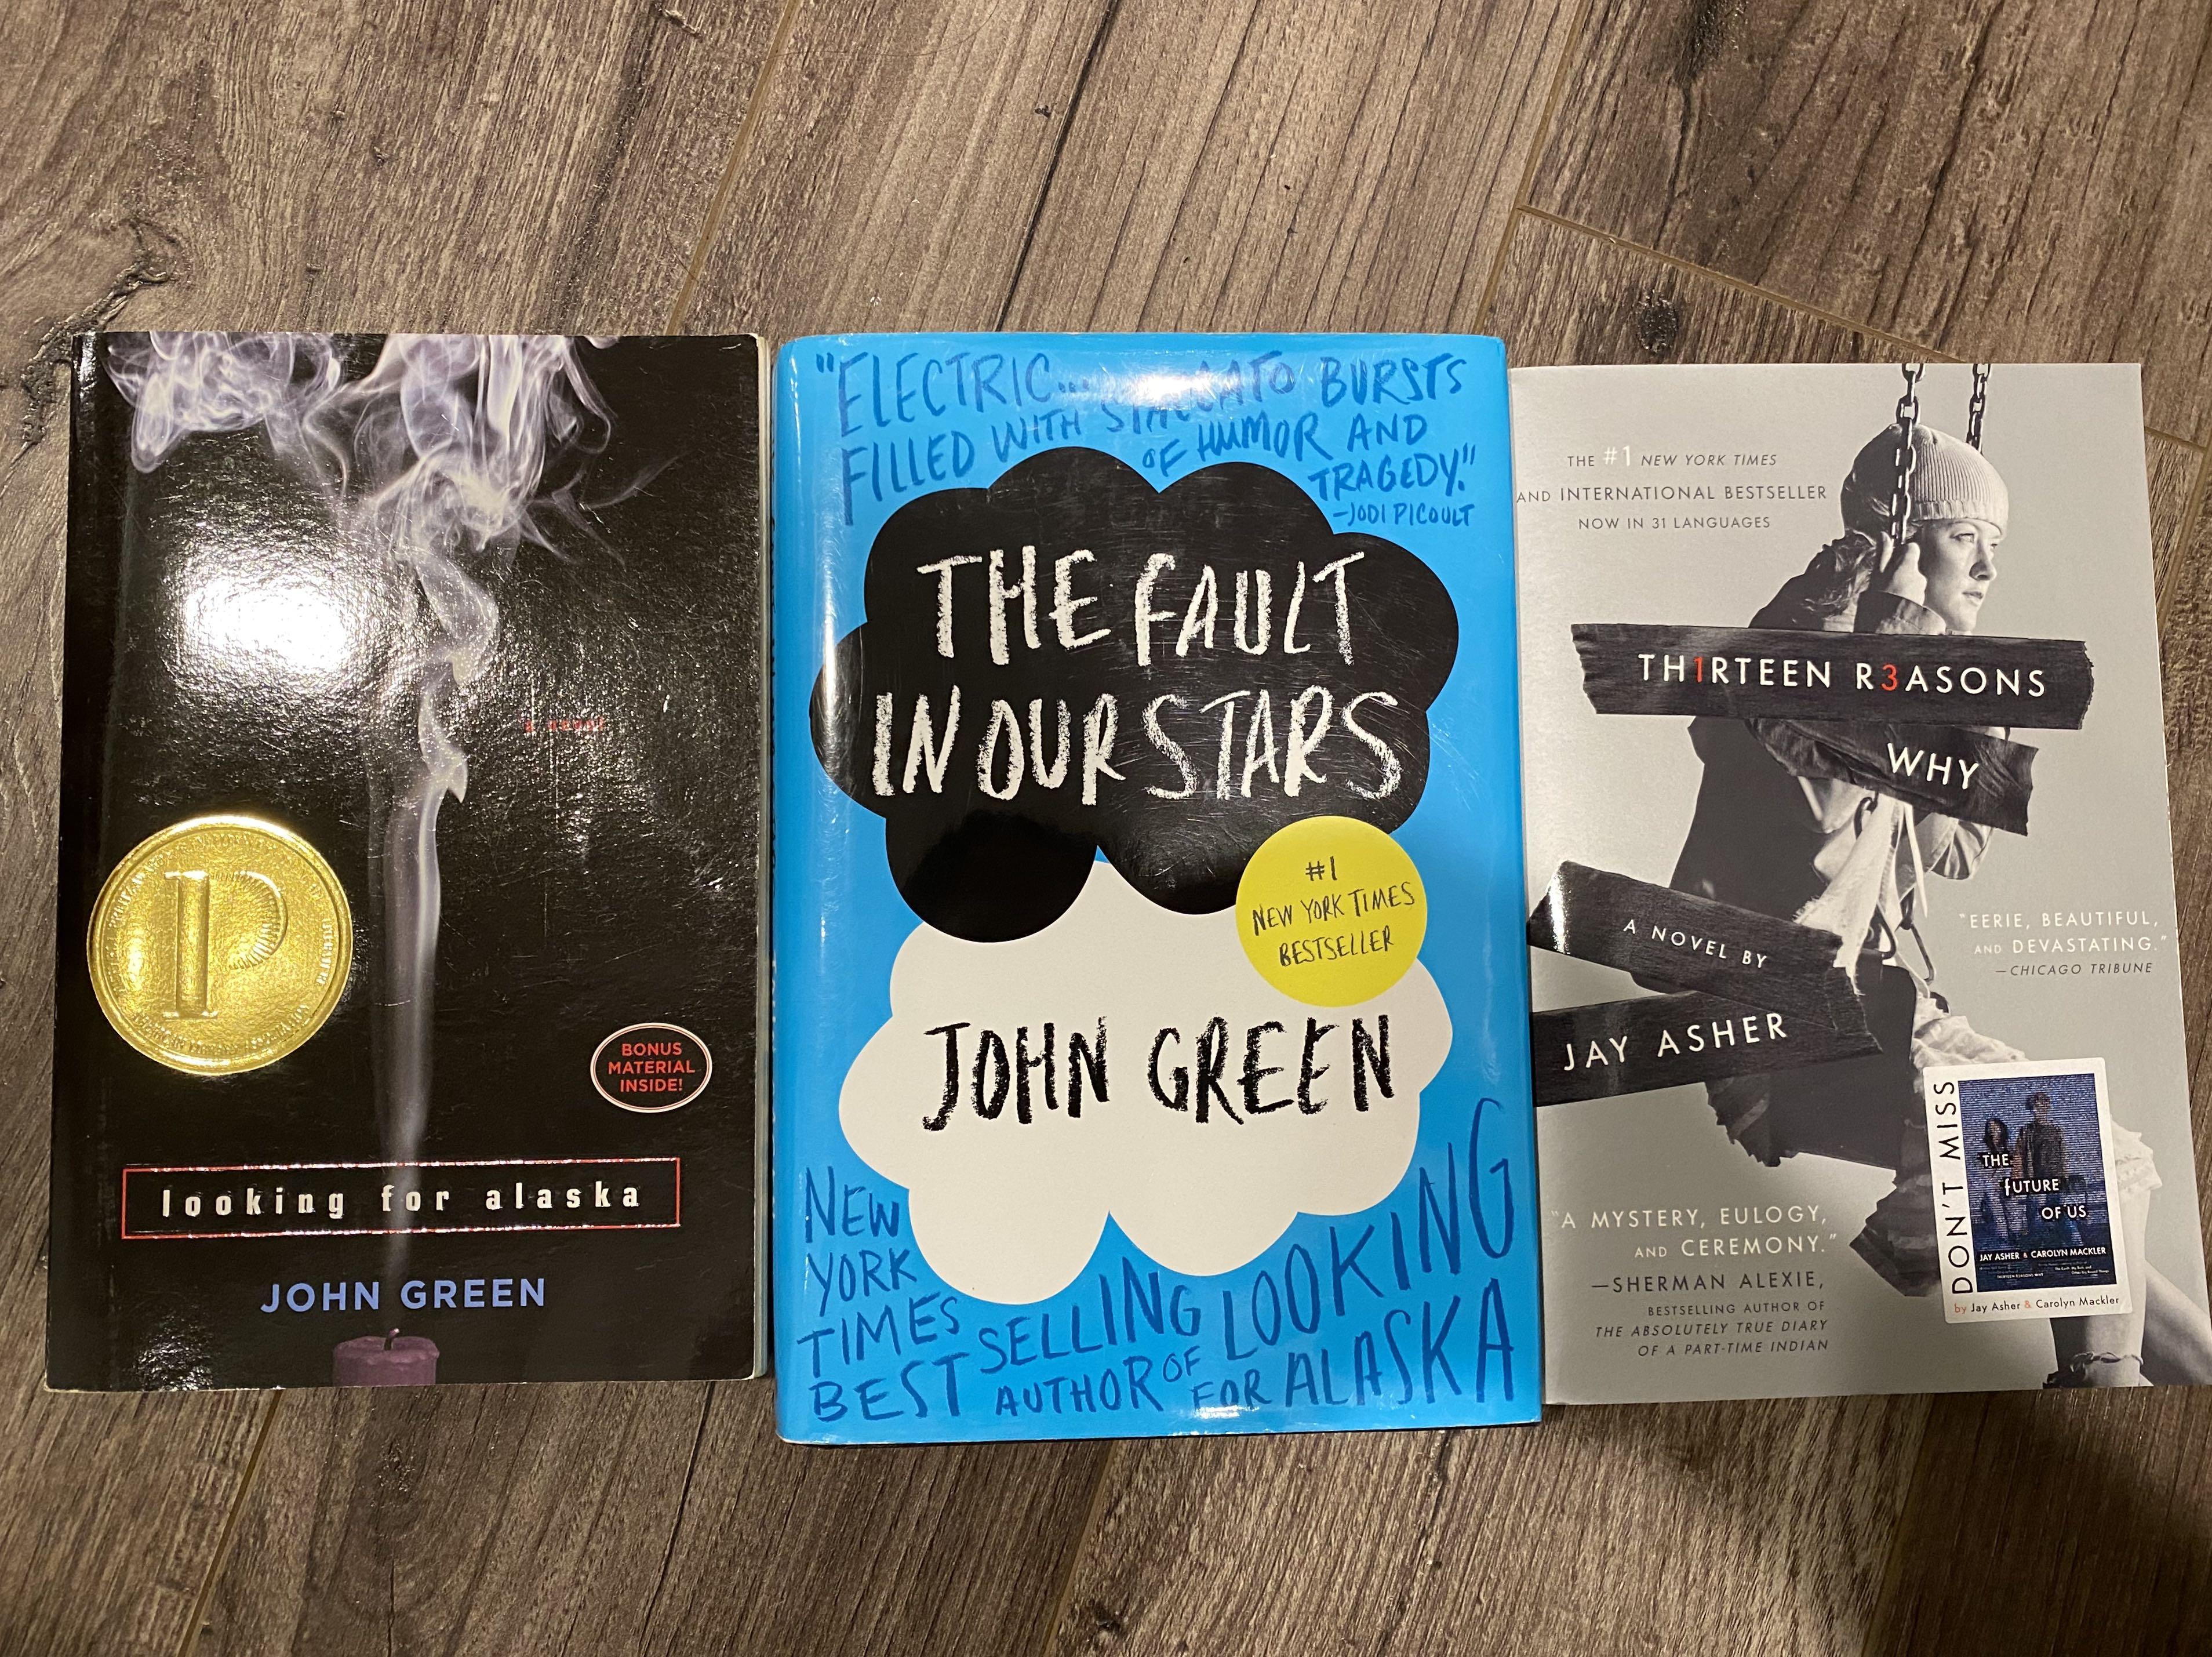 Book Bundle: John Green and Jay Asher